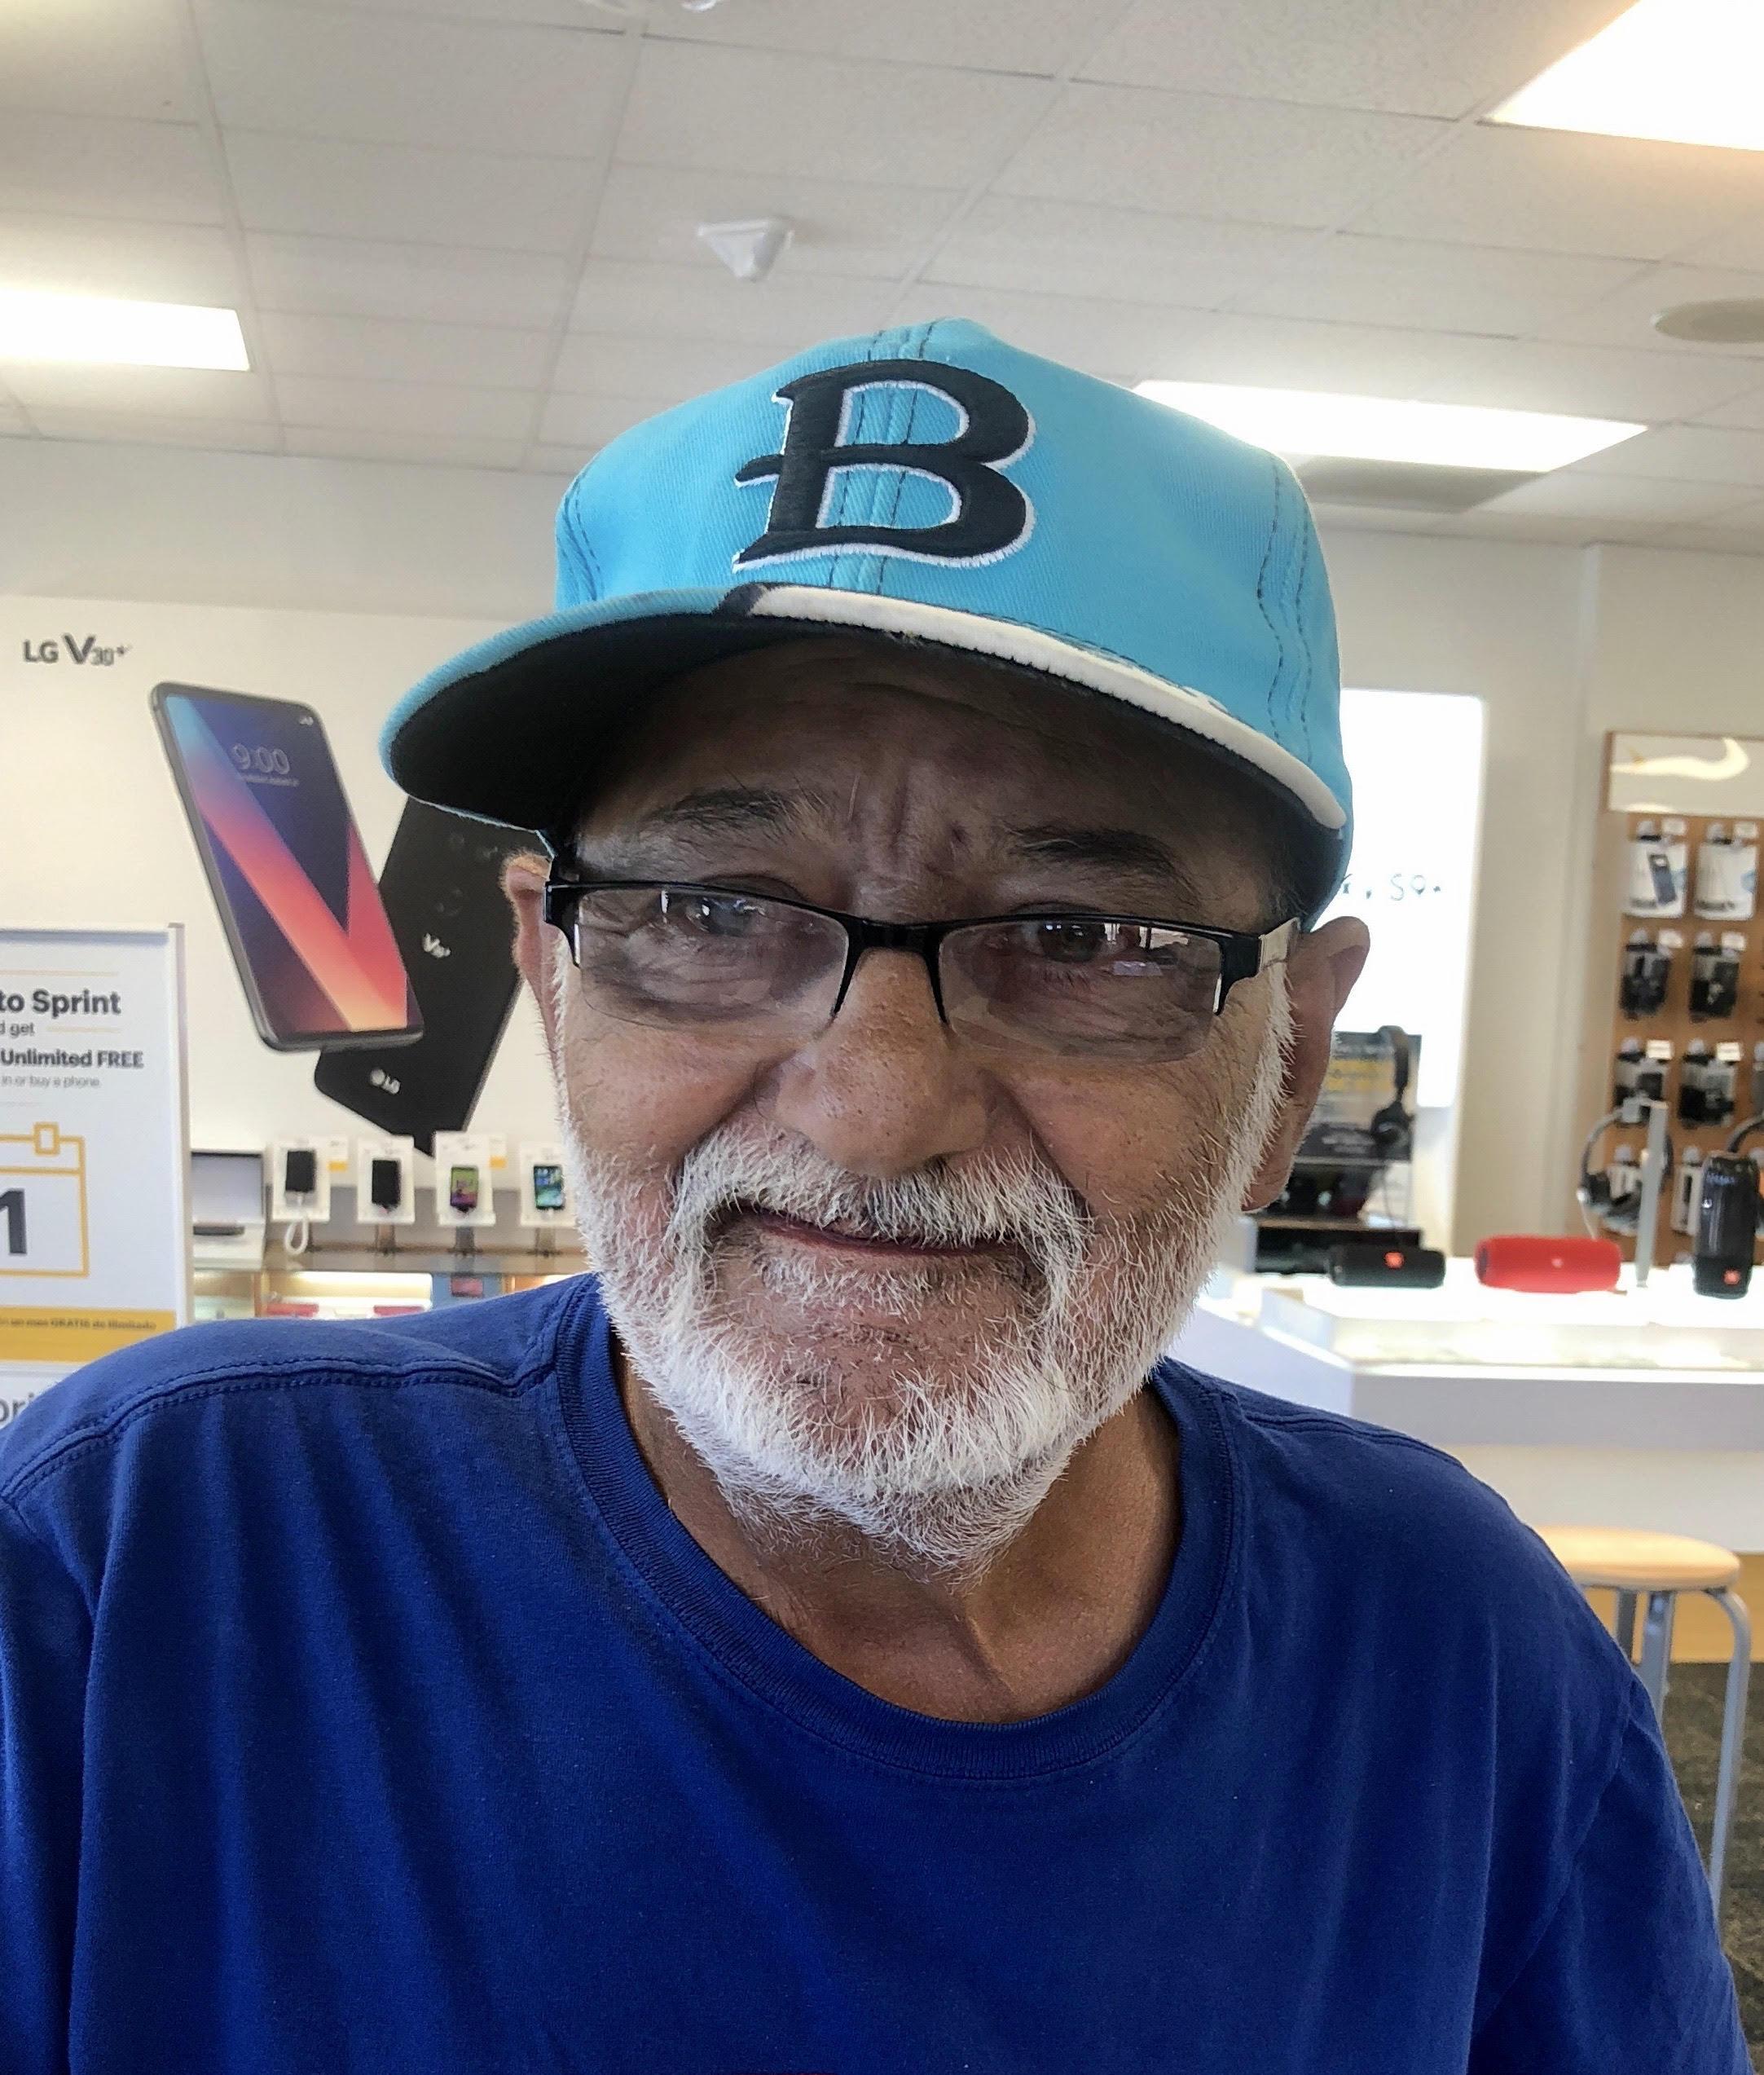 Frank M. Macri, III - Obituary - Fall River, MA / New Bedford, MA